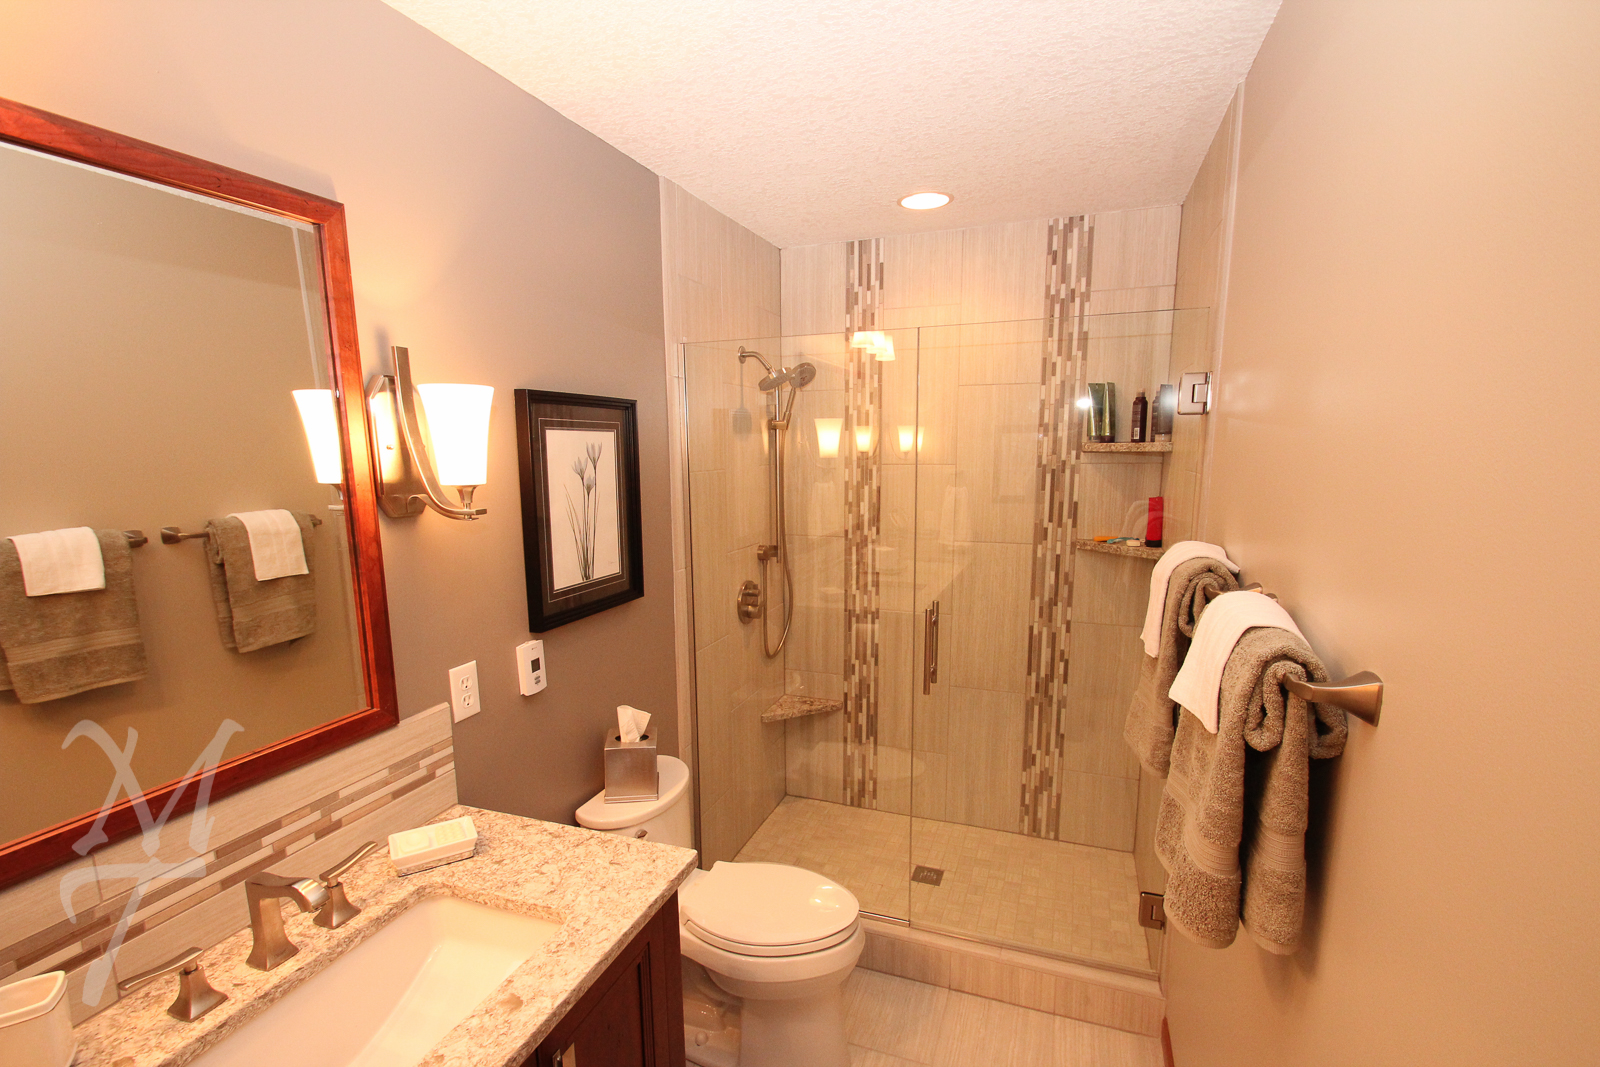 After_Bathroom_01B.jpg